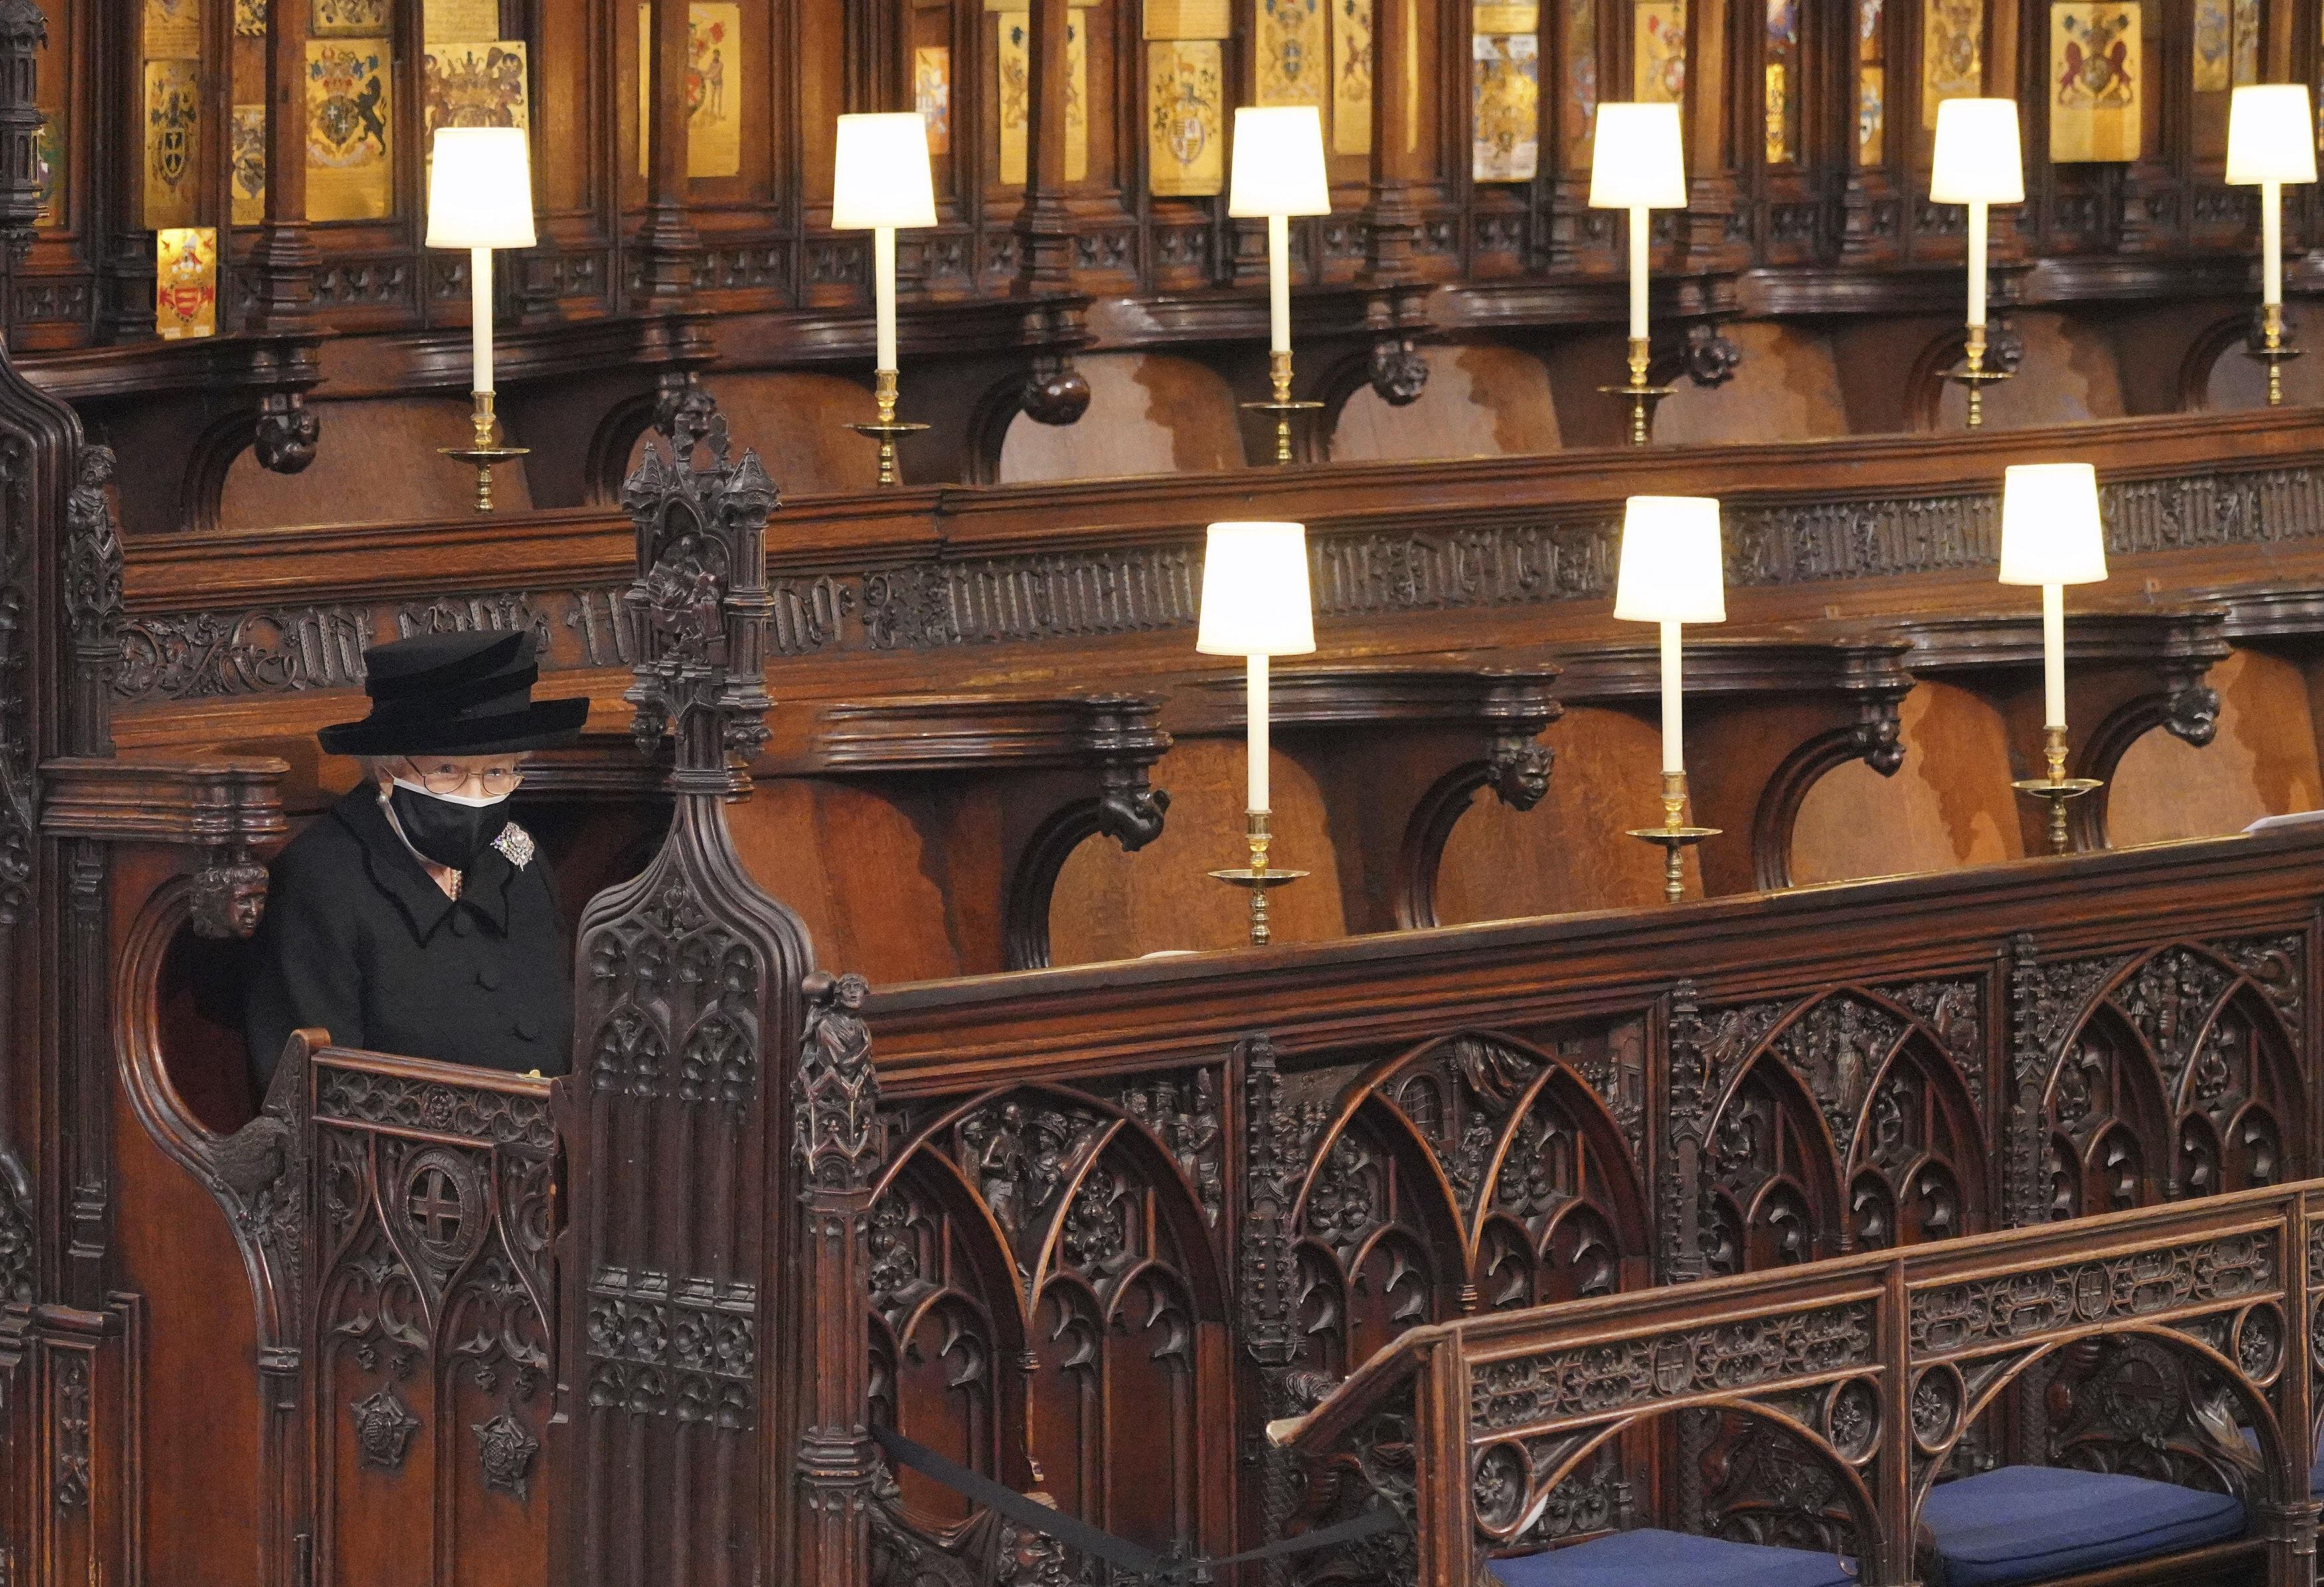 El funeral se celebró en la capilla de St. George, ubicada en el castillo de Windsor. (AP)